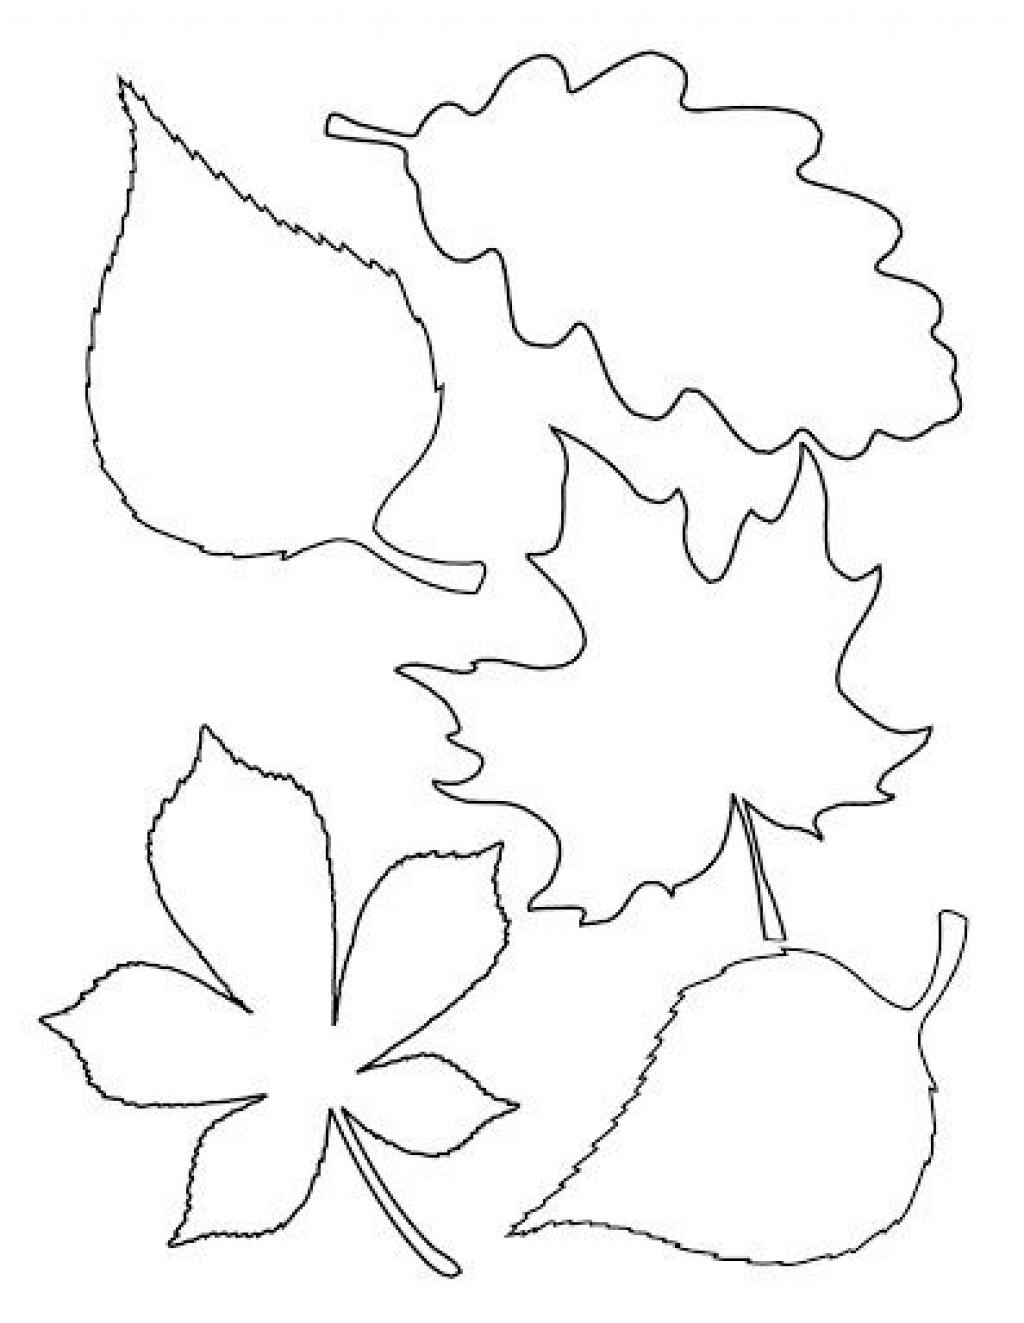 004 Unique Blank Leaf Template With Line Design  Lines PrintableLarge